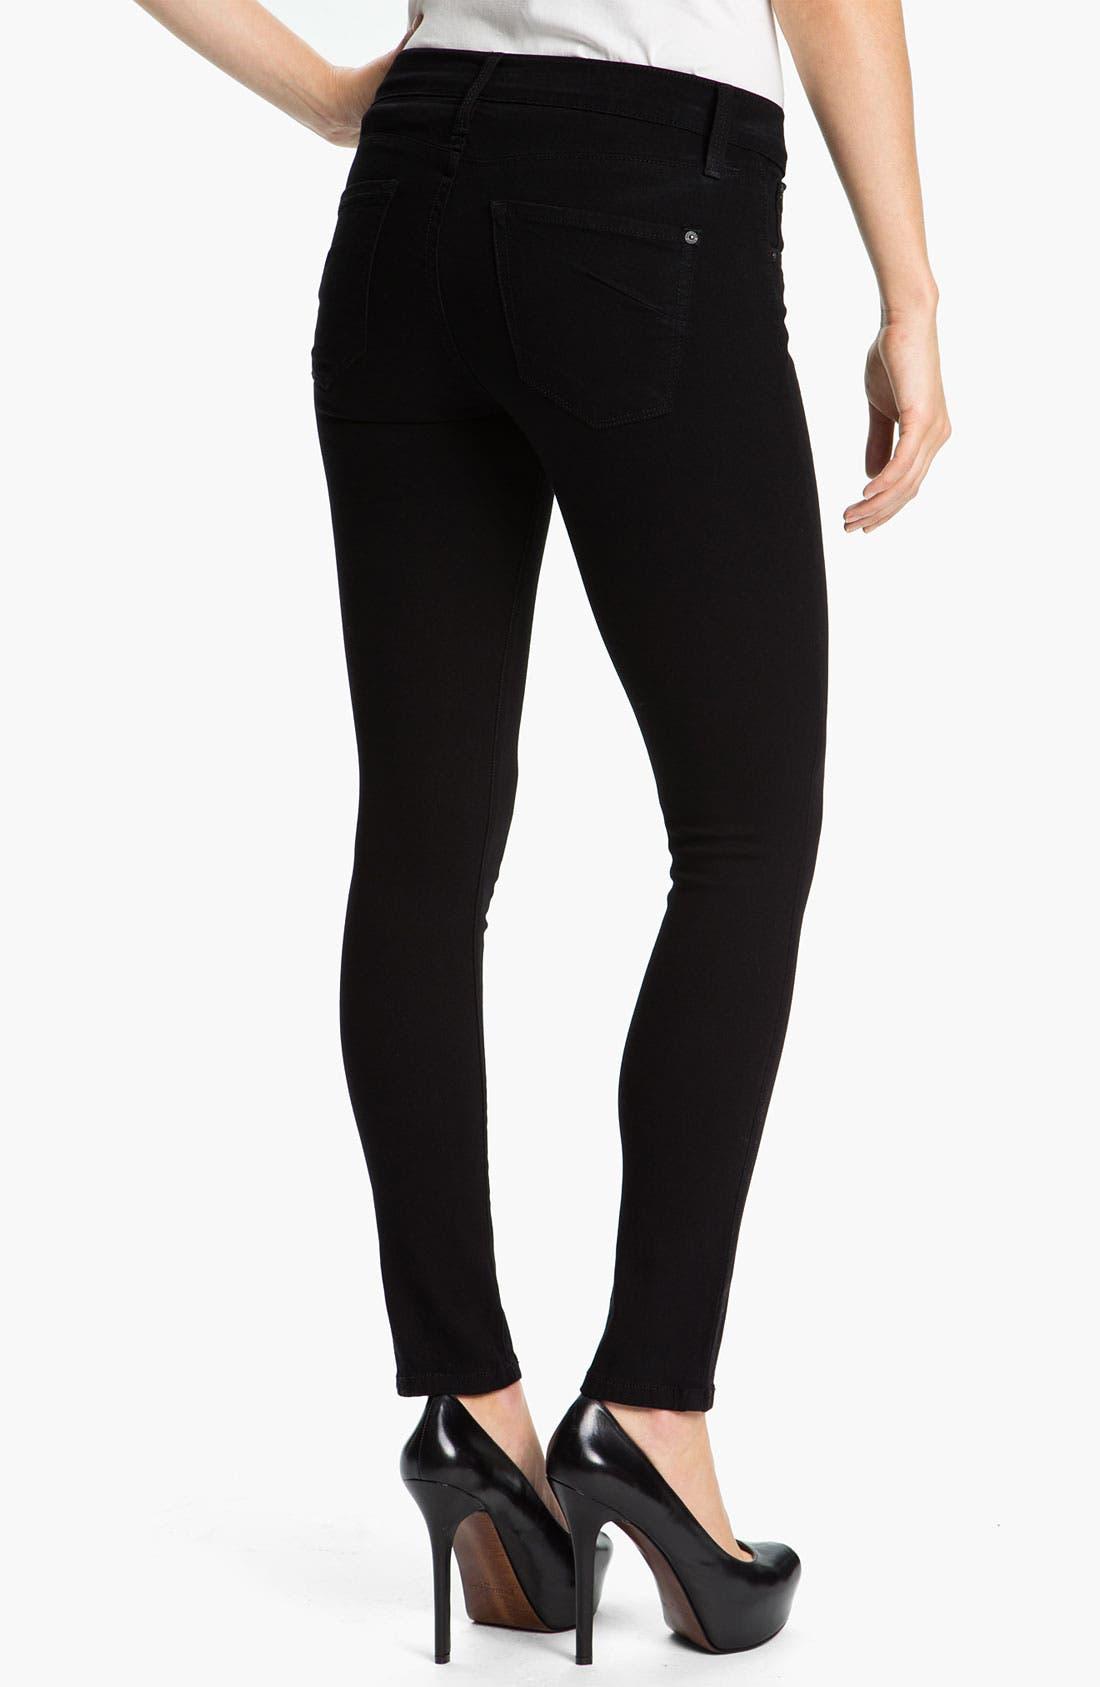 Alternate Image 2  - James Jeans 'Ritchie' Slim Jeans (Black Clean) (Petite) (Online Exclusive)